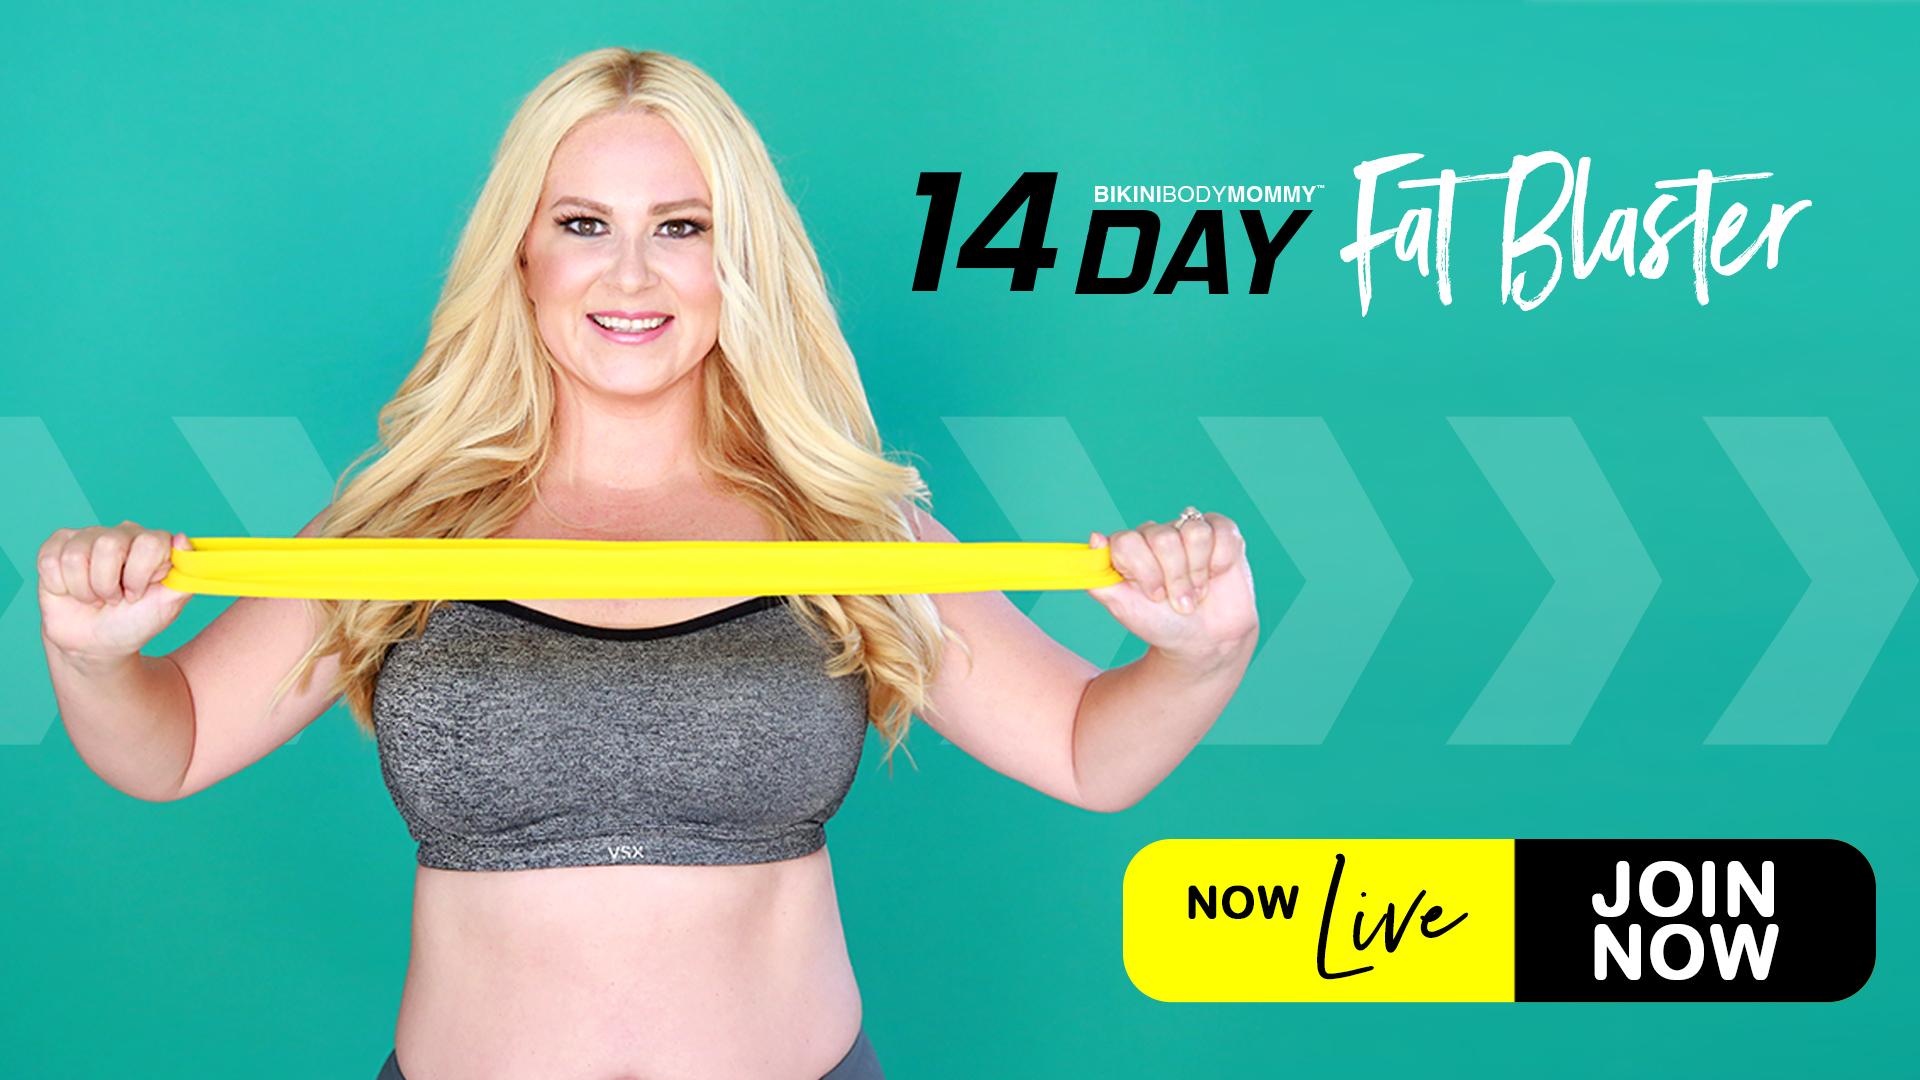 BBM 14 DAY FAT BLASTER    ★★★★★   $49.95